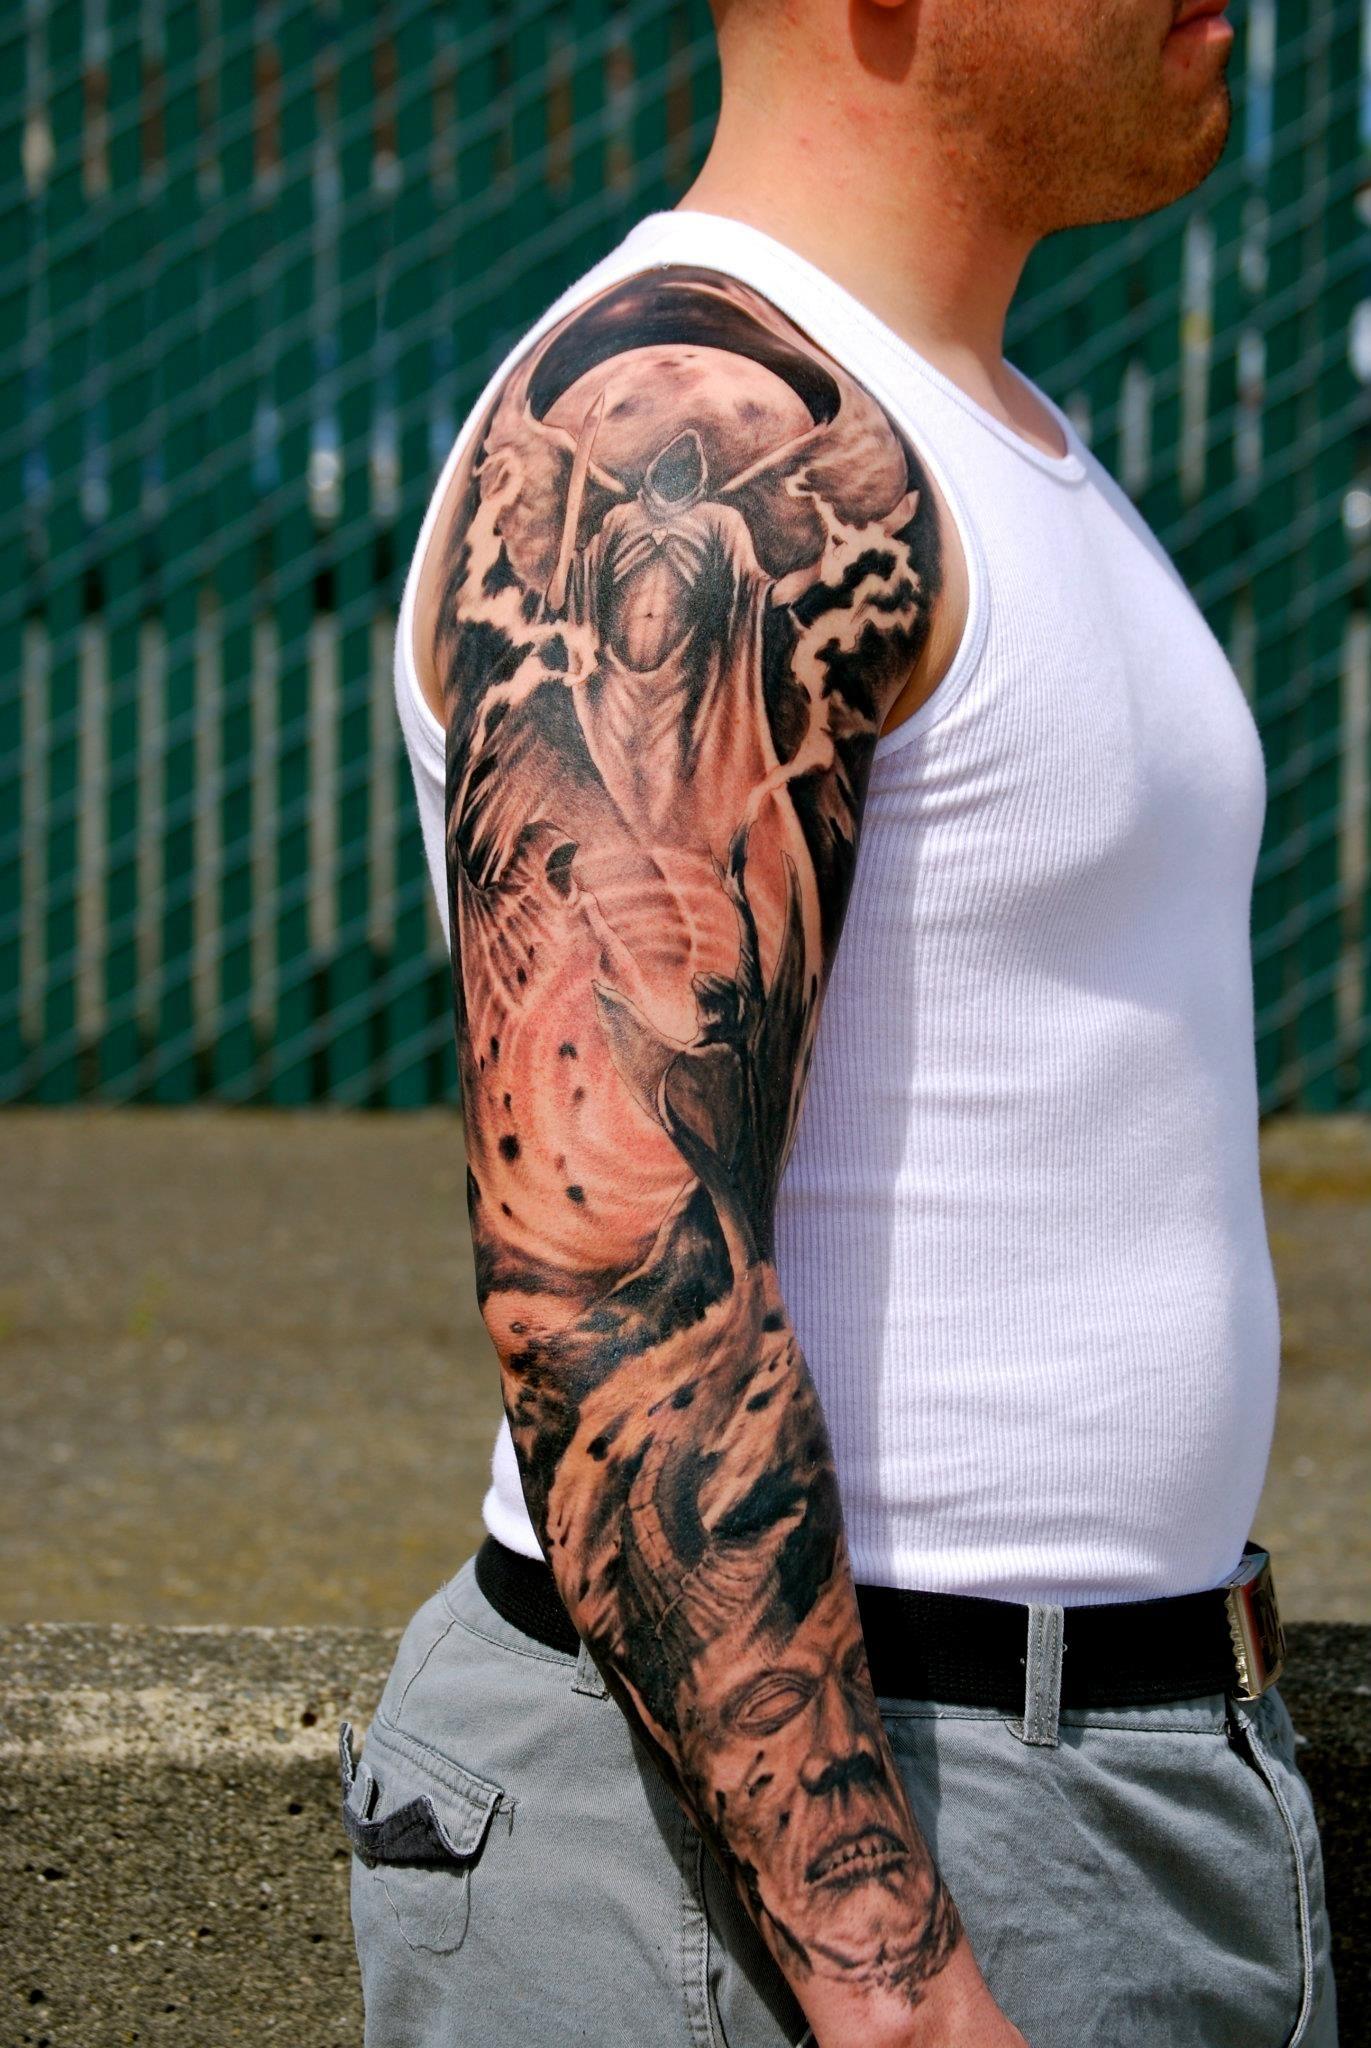 Nicholas beuthien super genius tattoo seattle wa black